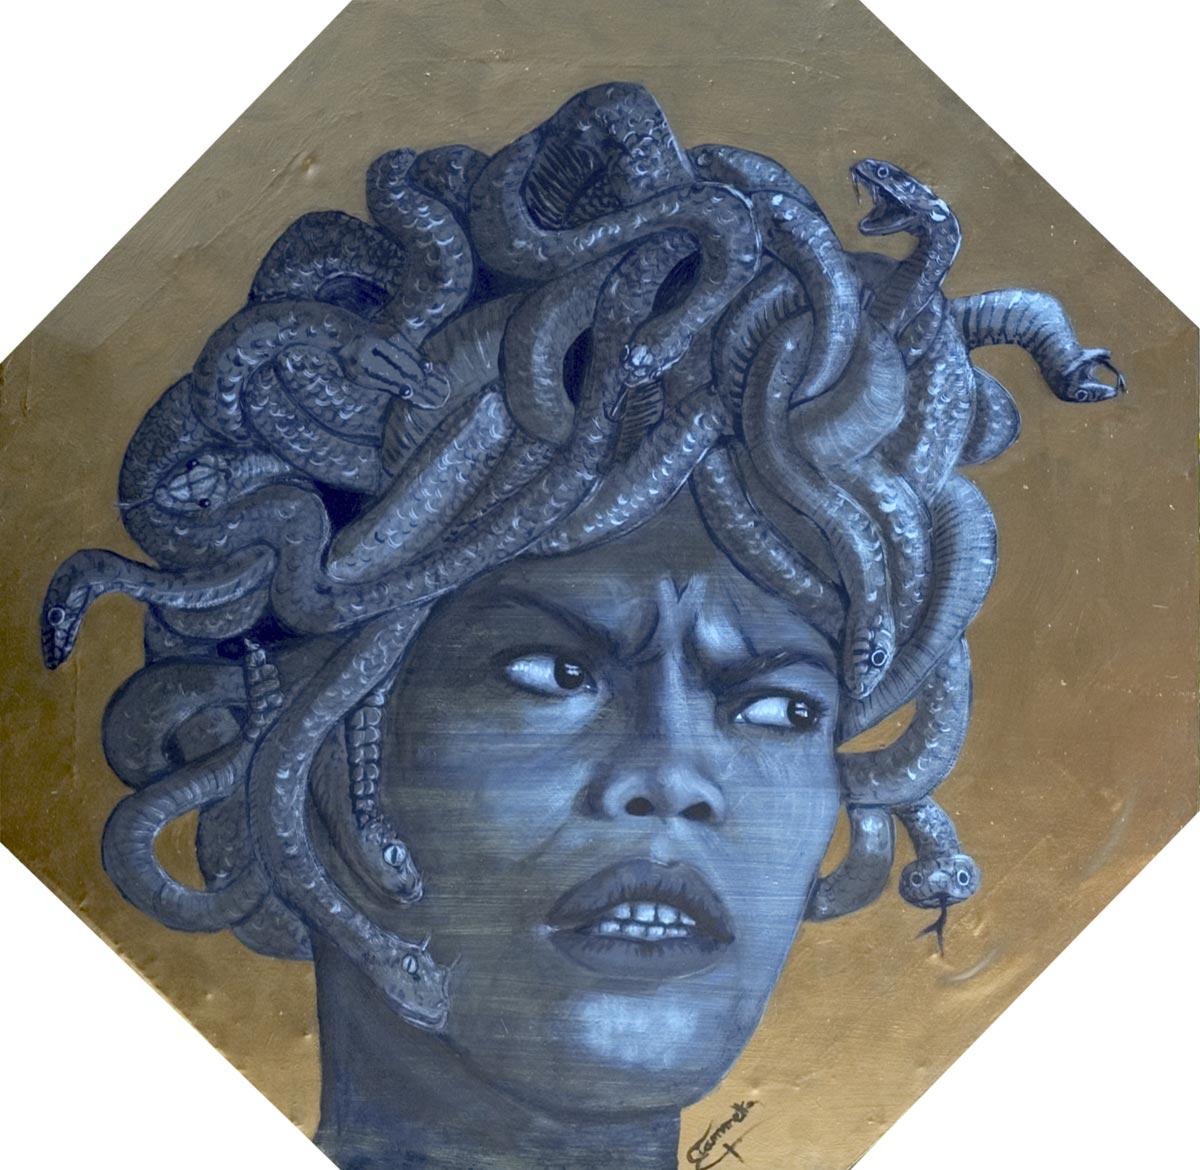 Medusa - acrilico su lenzuolo montato su tela artigianale ad Ottagono lato cm 46